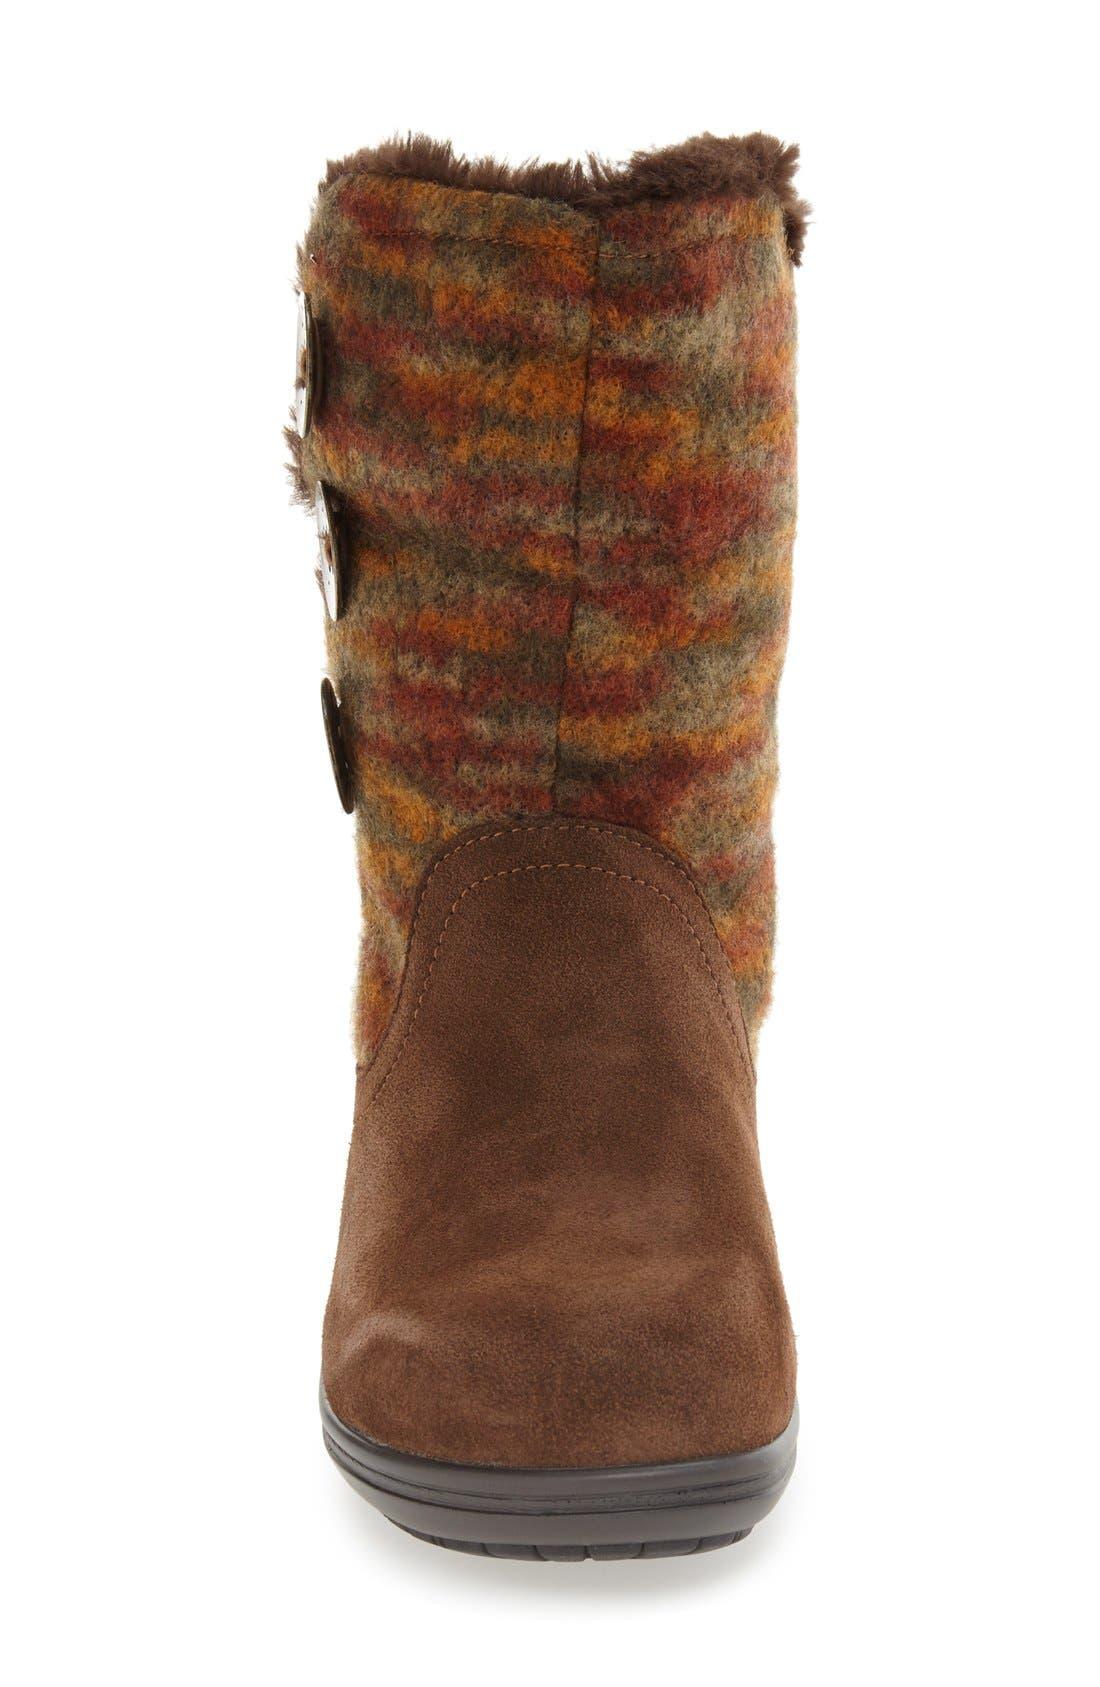 Alternate Image 3  - Alegria 'Nanook' Suede Boot (Women)